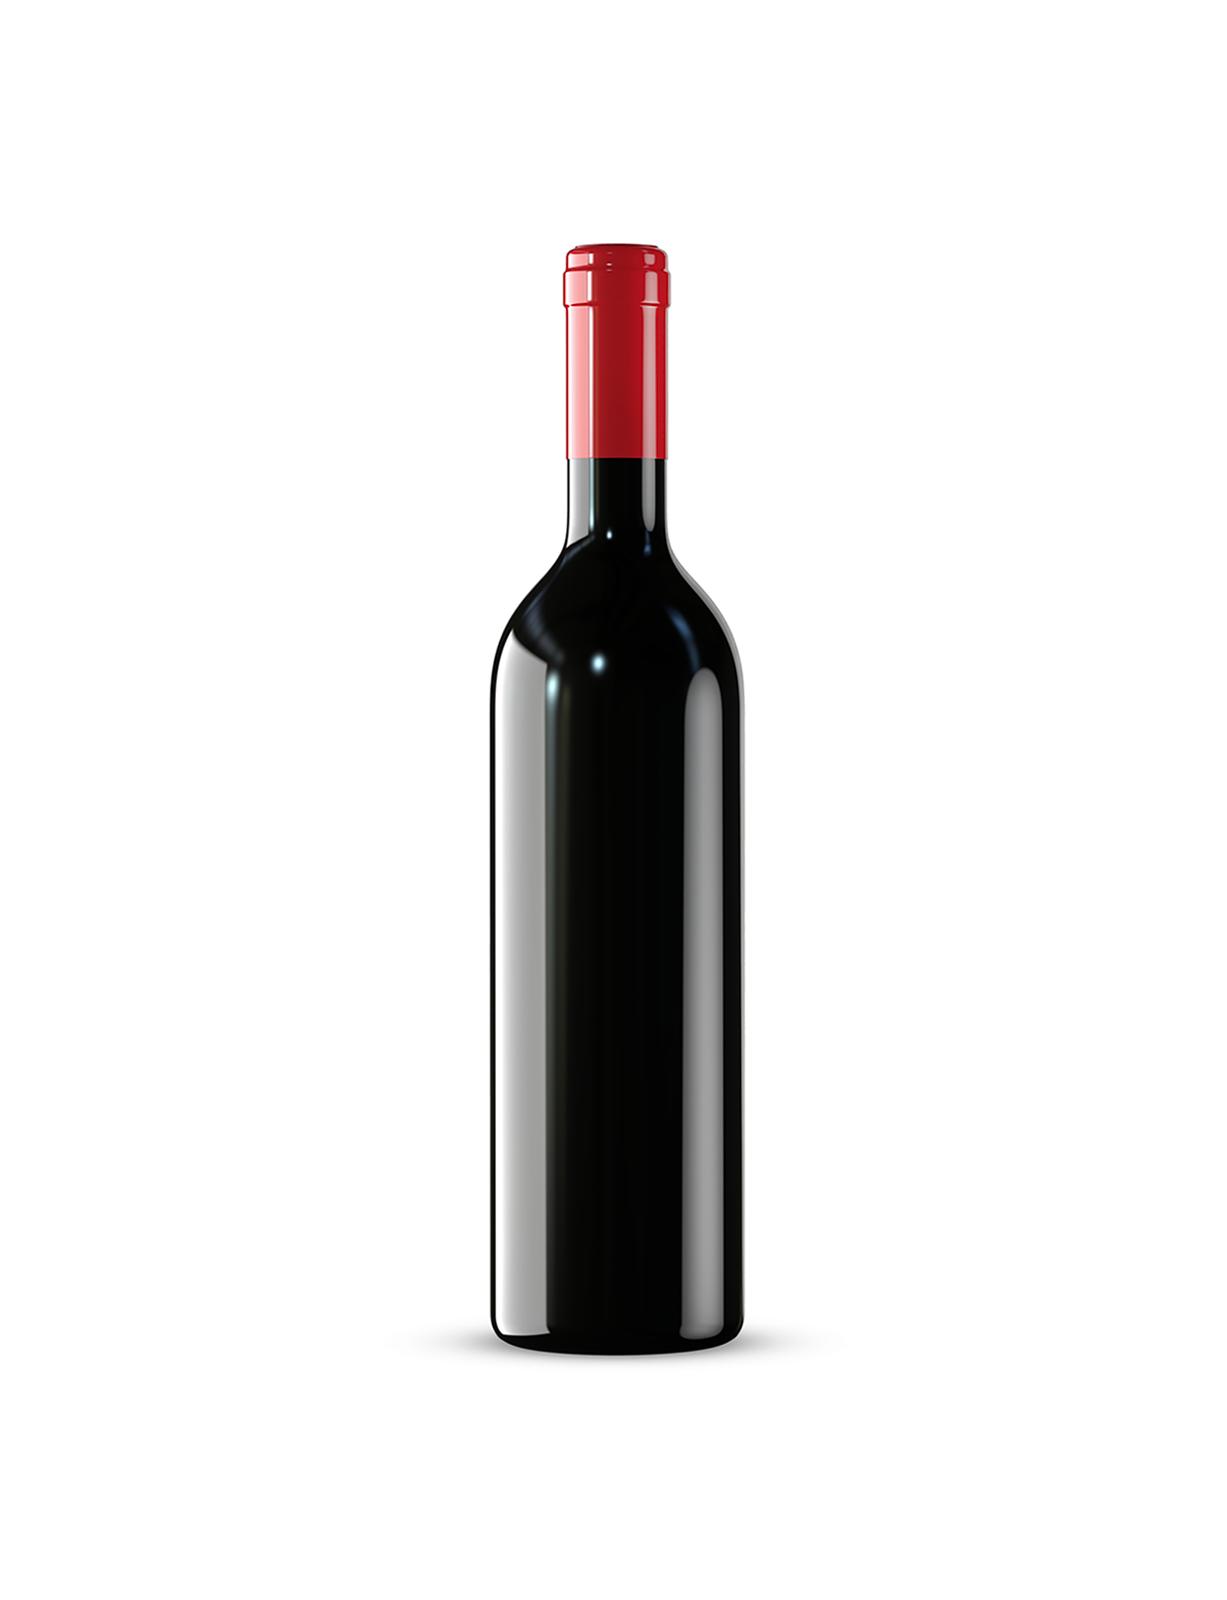 Buisson Battault Meursault Vieilles Vignes 2018